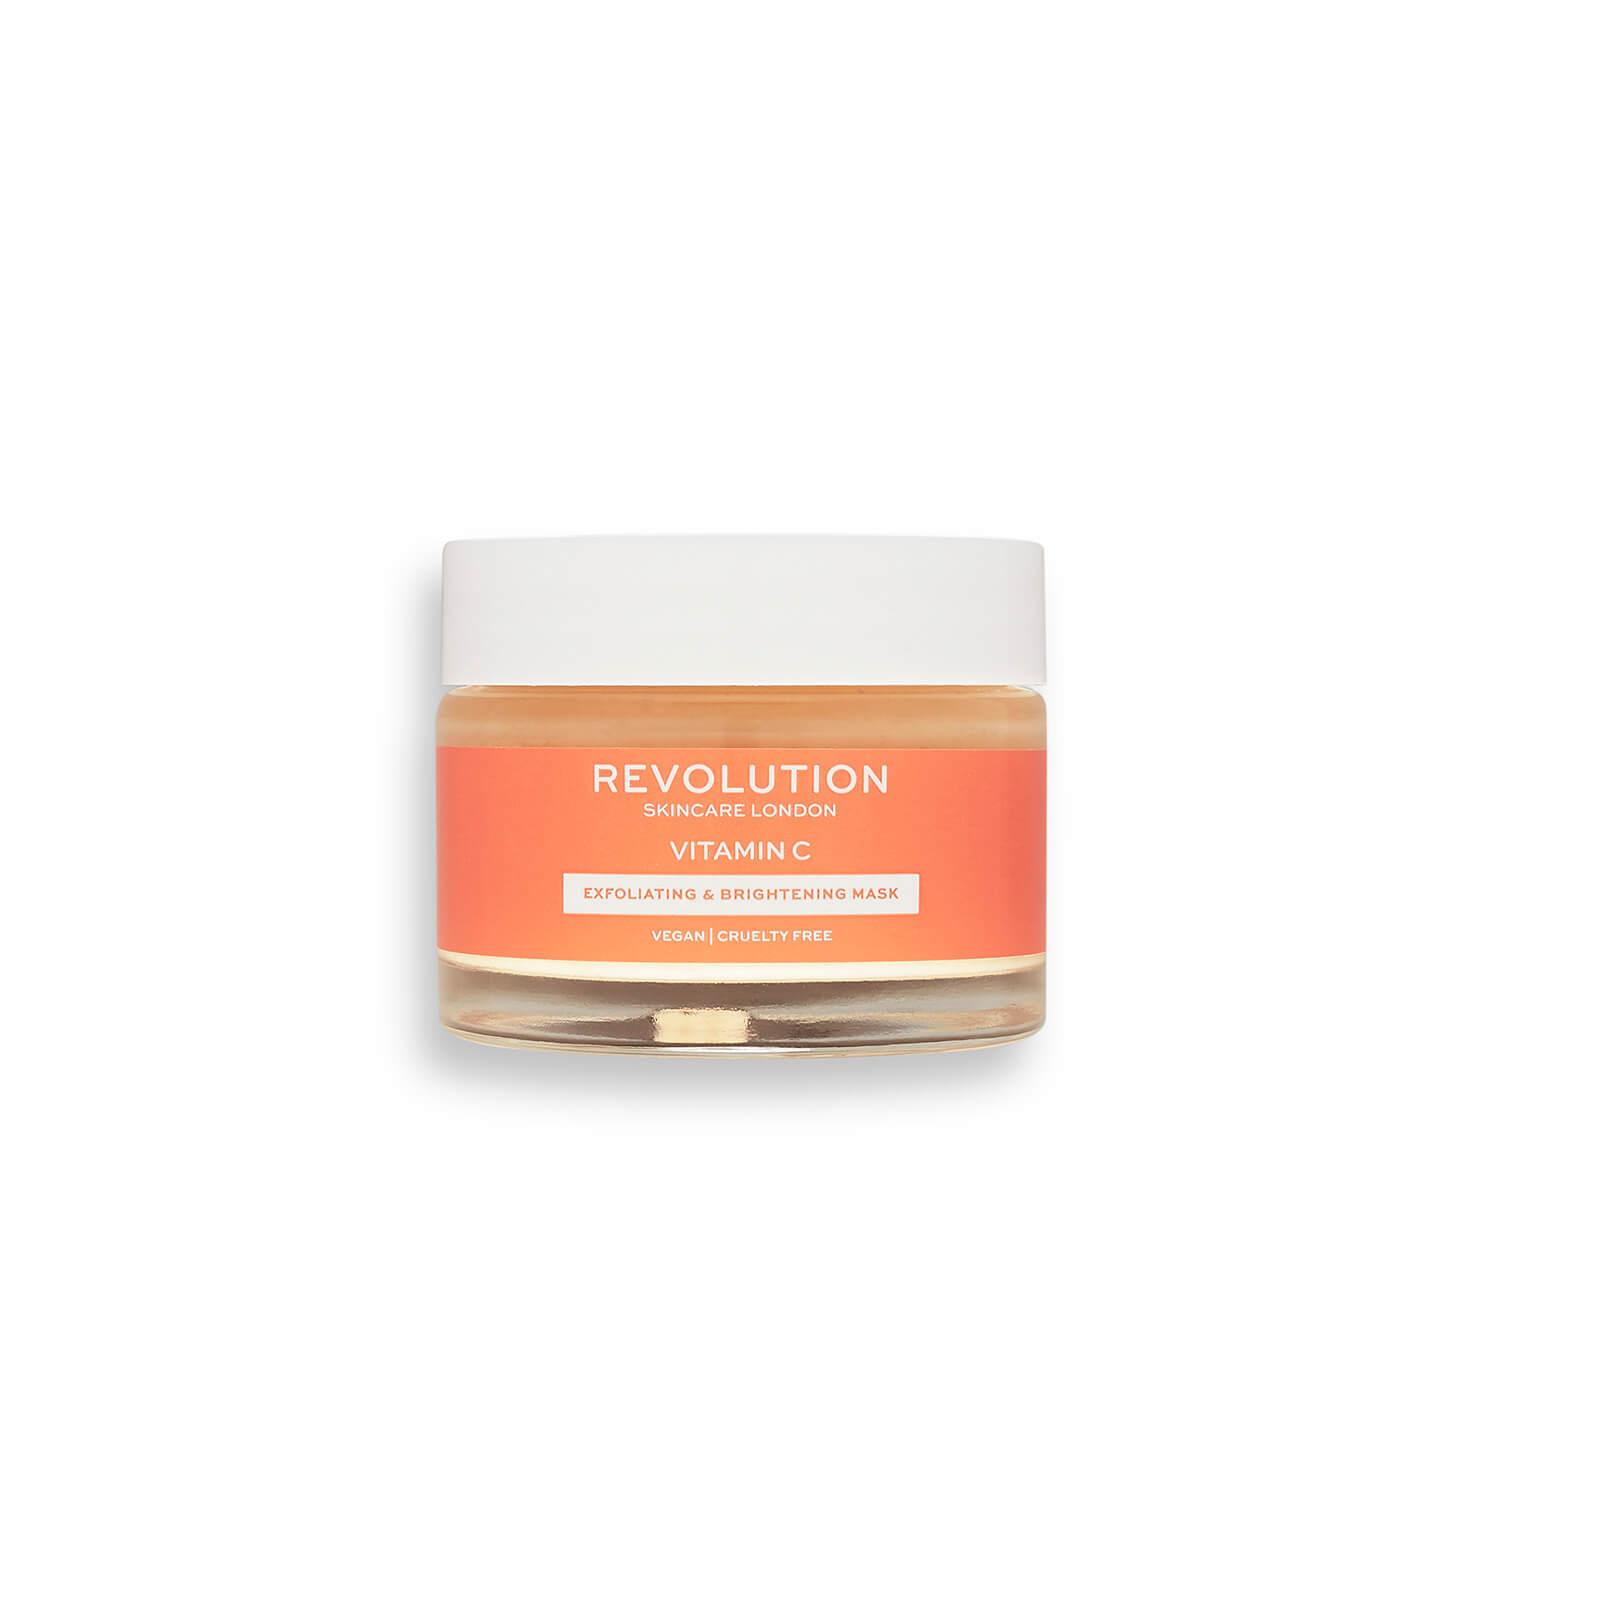 Купить Revolution Skincare Vitamin C, Turmeric & Cranberry Seed Energising Mask